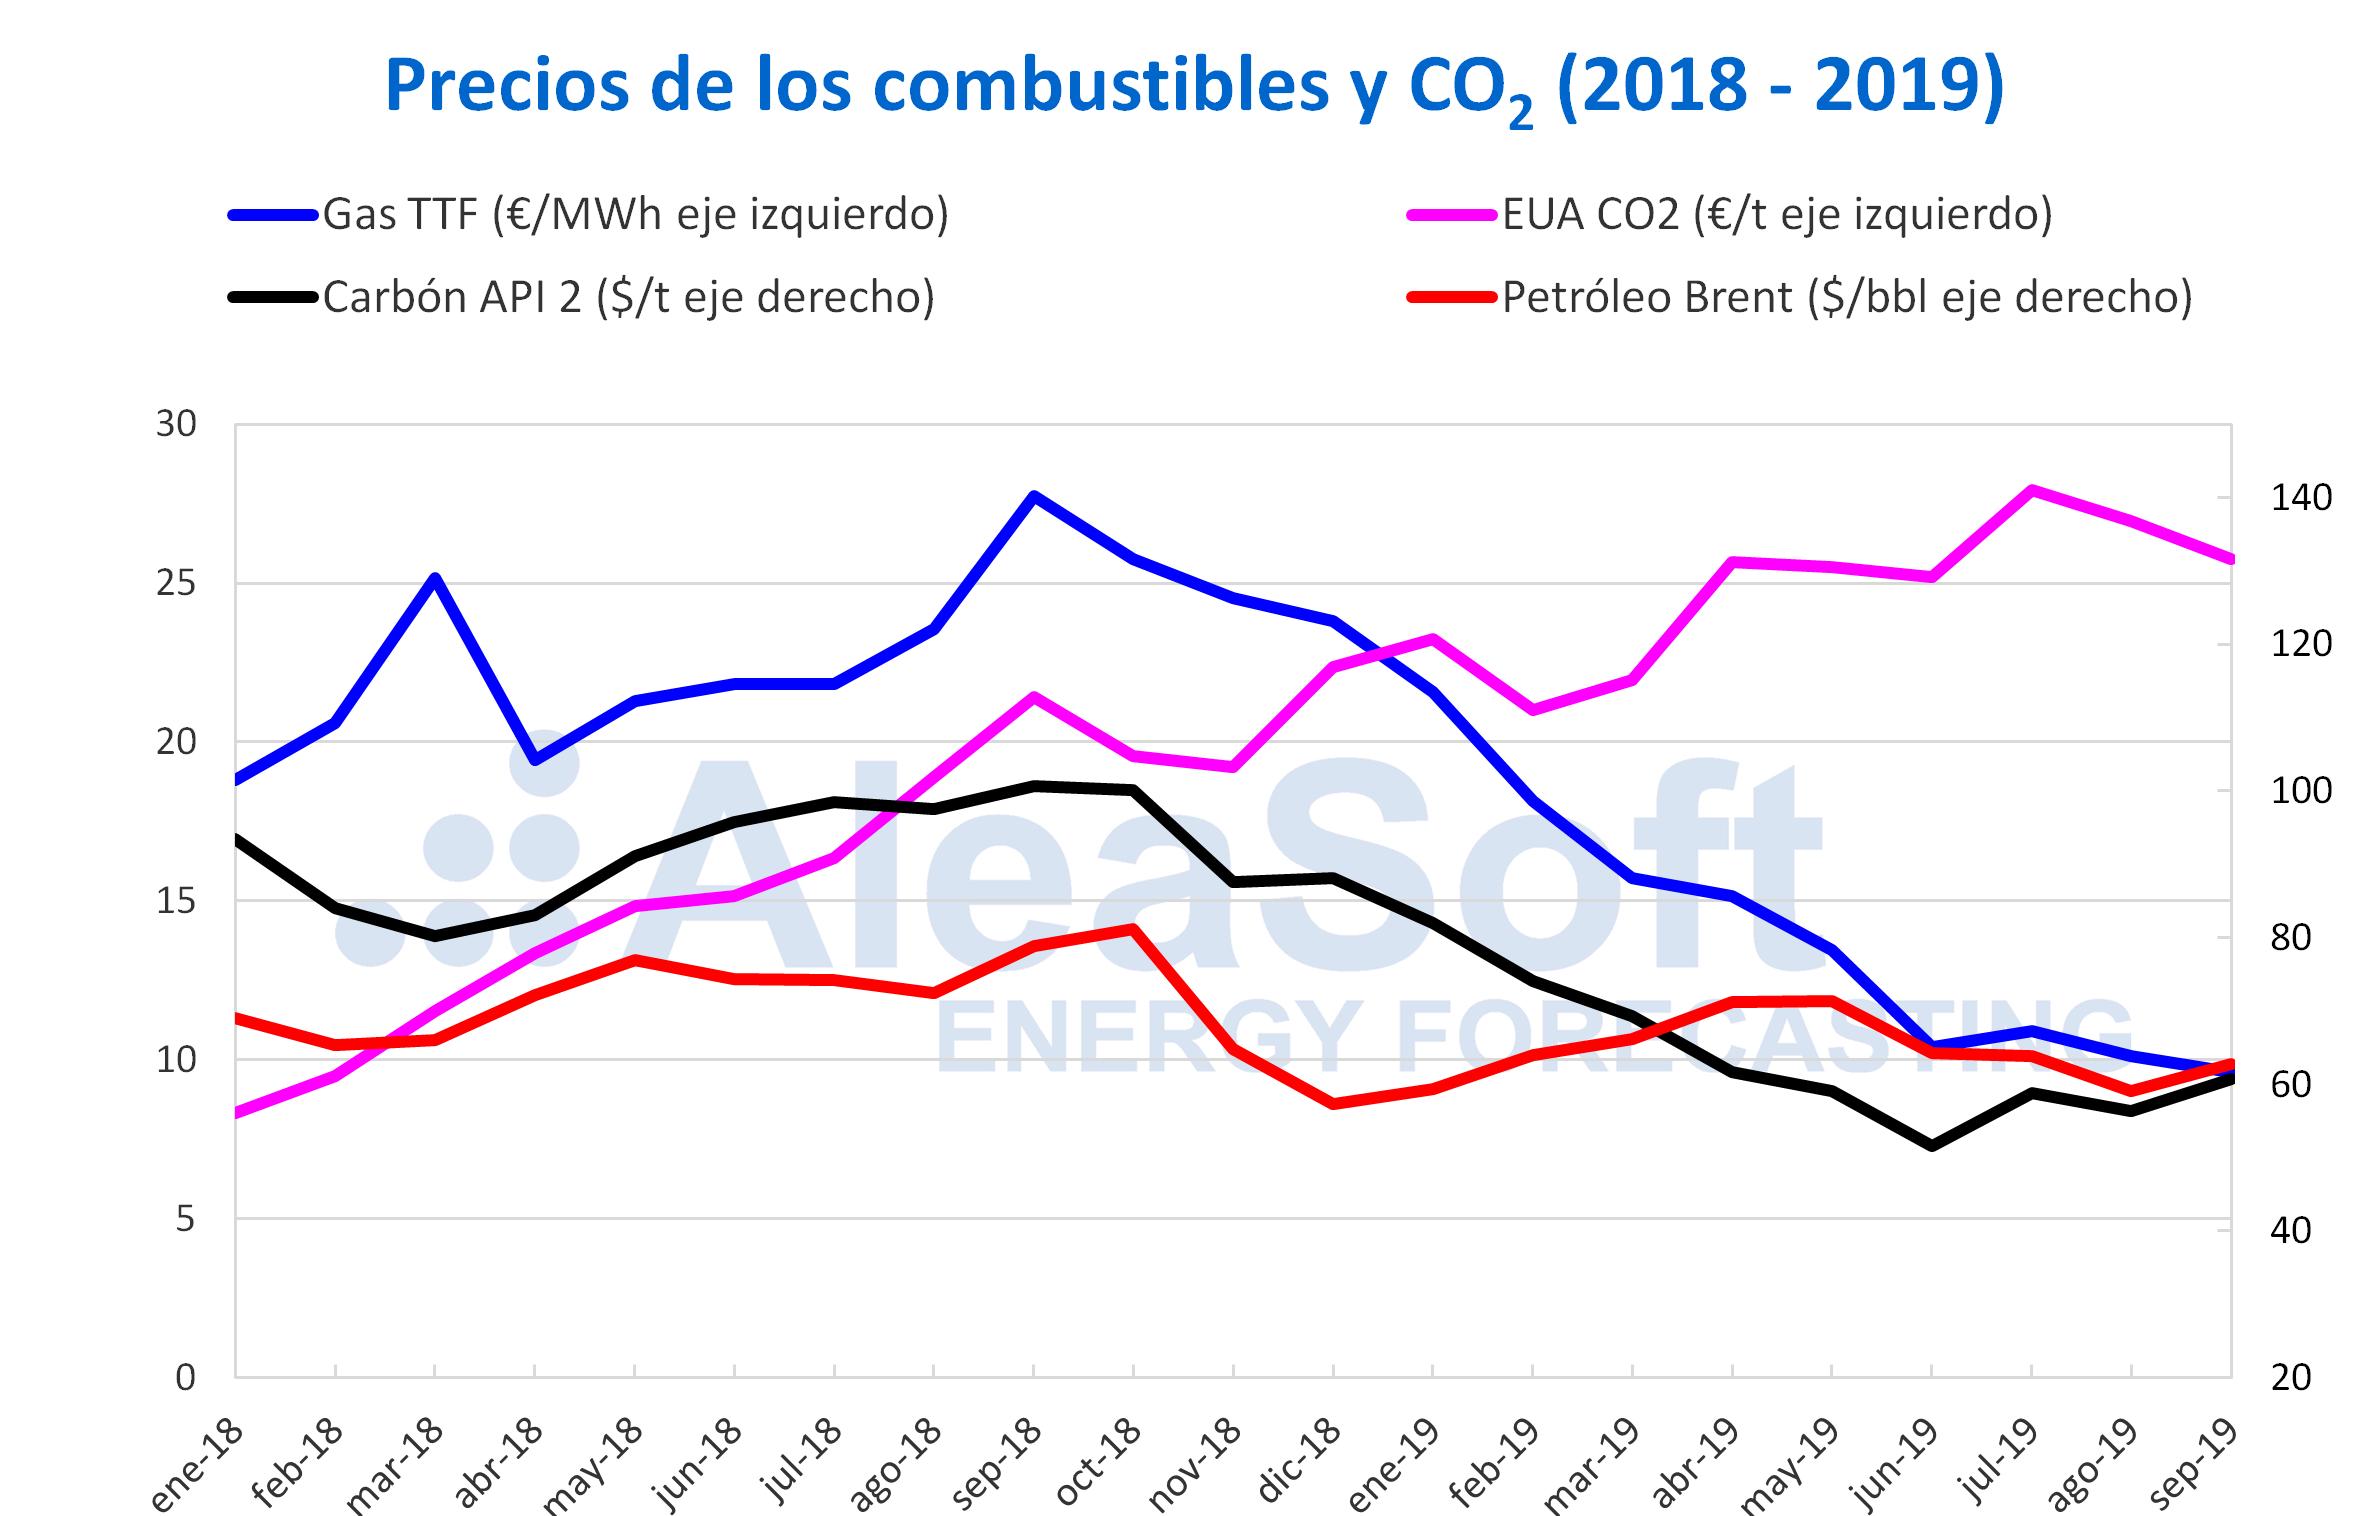 AleaSoft - Precios gas carbón Brent CO2 2018-2019